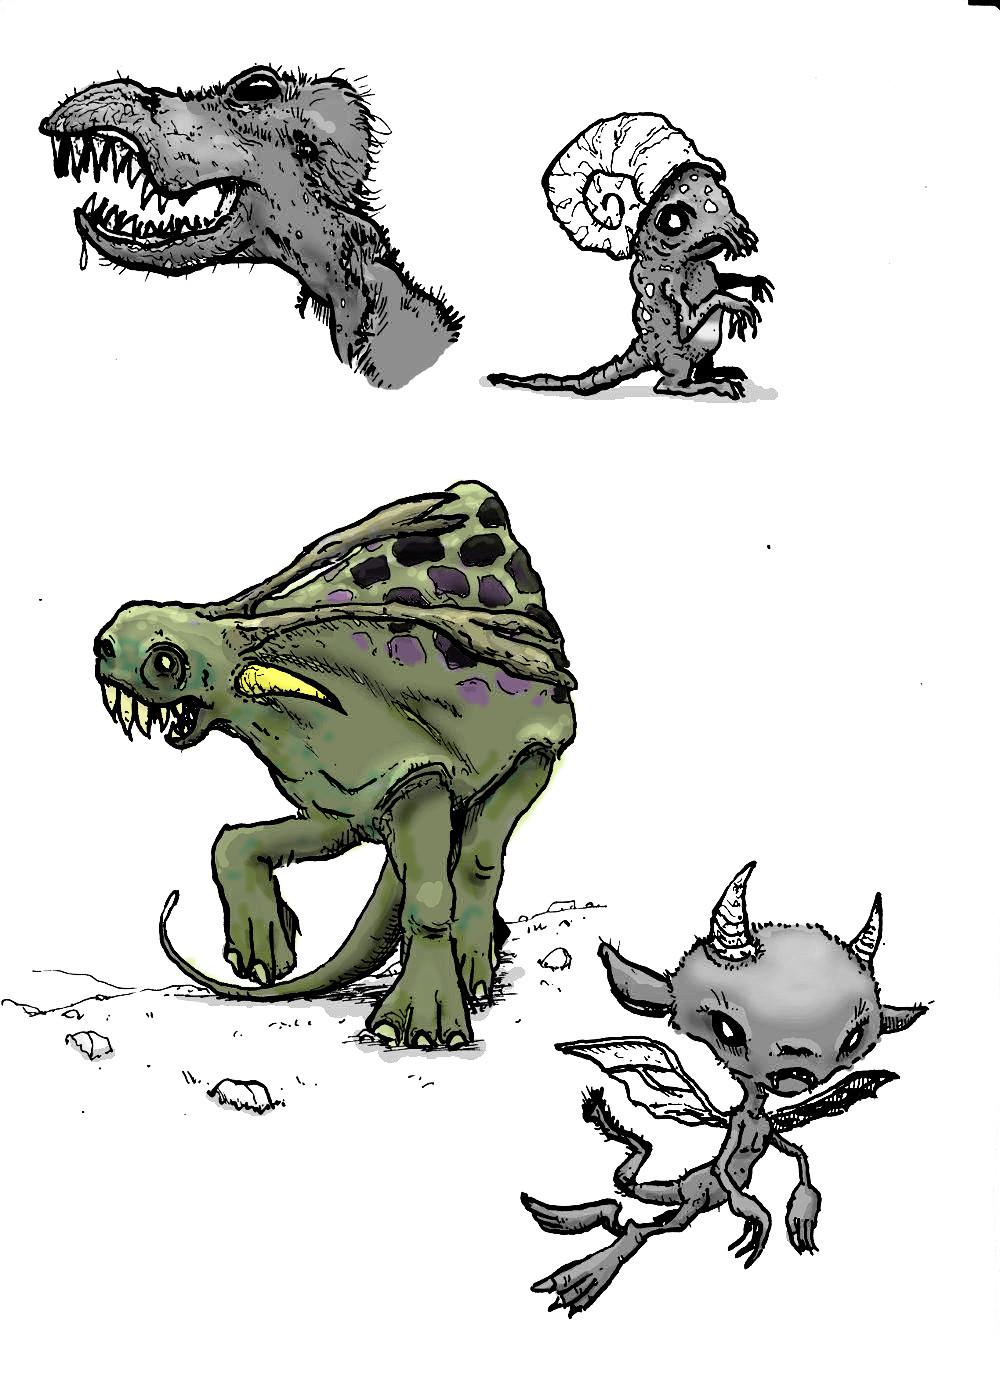 dessin de stefrex - Page 3 641441creatures352netbfiltrecolonet